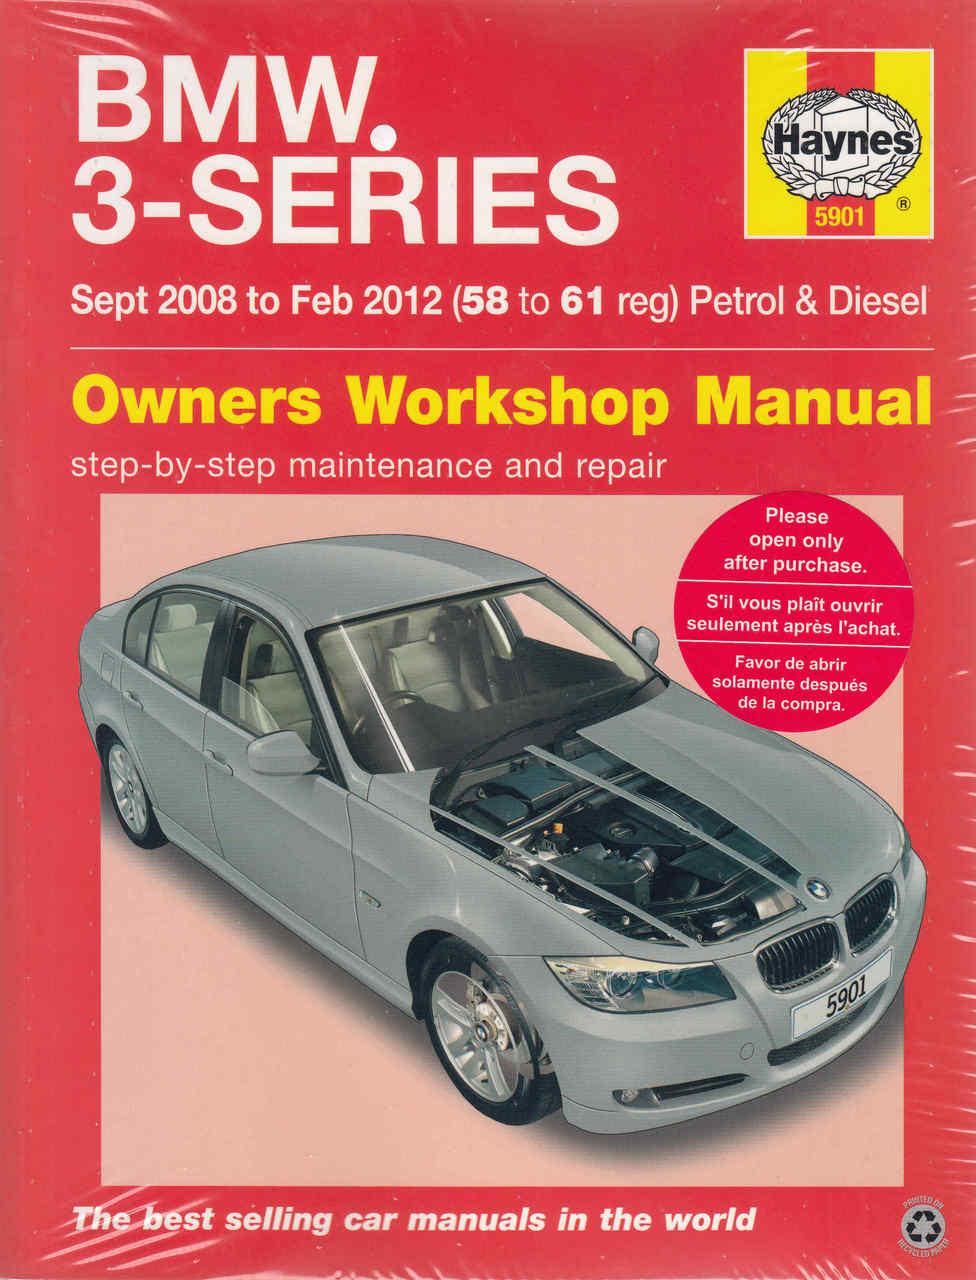 bmw 3 series e90 e91 sept 2008 feb 2012 petrol diesel workshop rh automotobookshop com au bmw e91 service manual pdf bmw e90 maintenance manual pdf